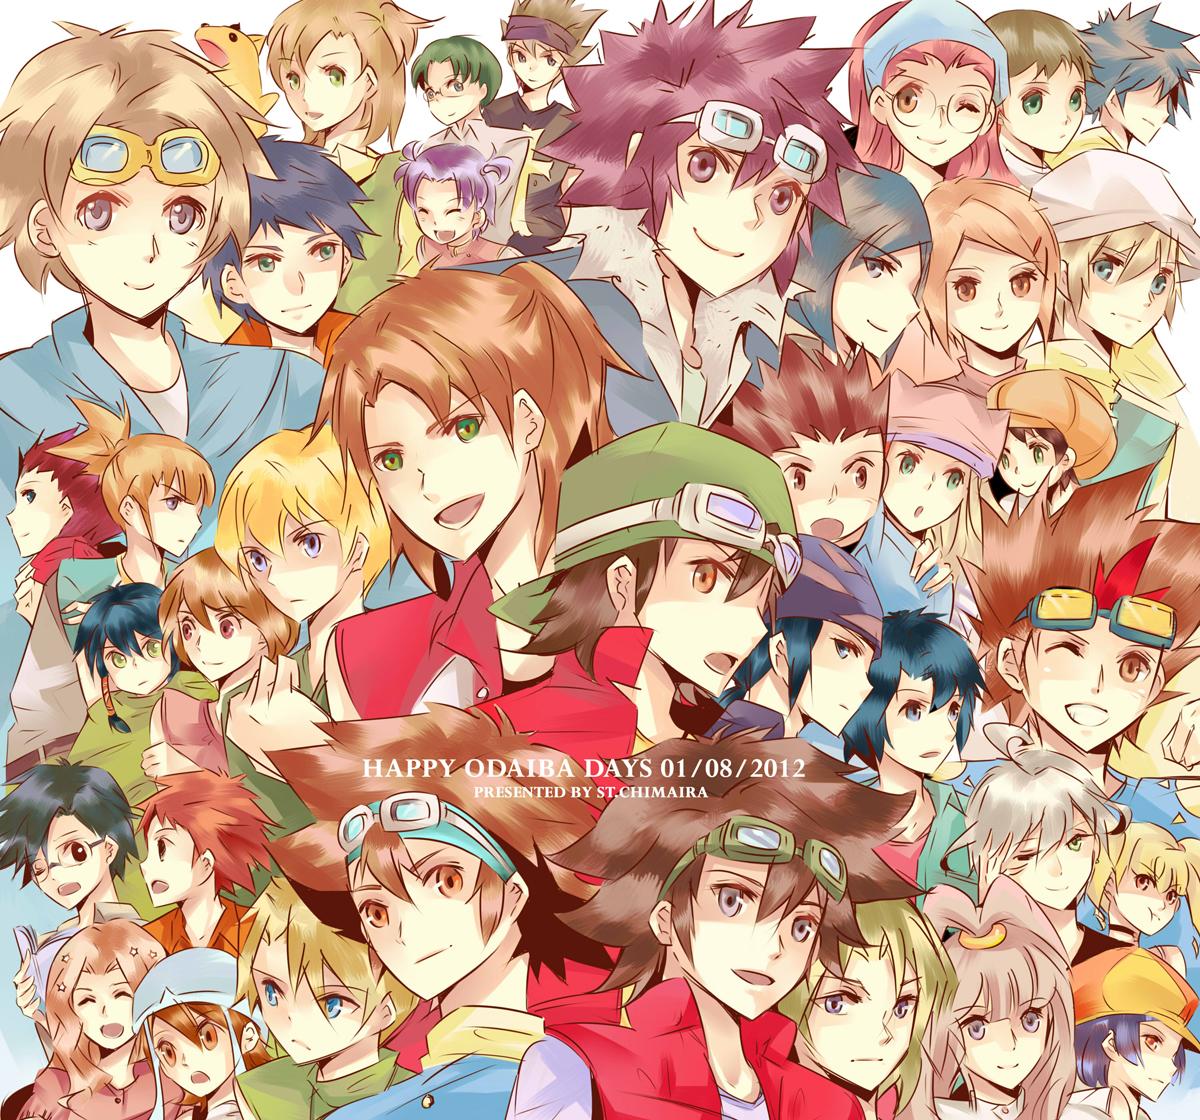 Fanarts Memorial Day Happy_odaiba_days__by_saint_chimaira-d59qw7d